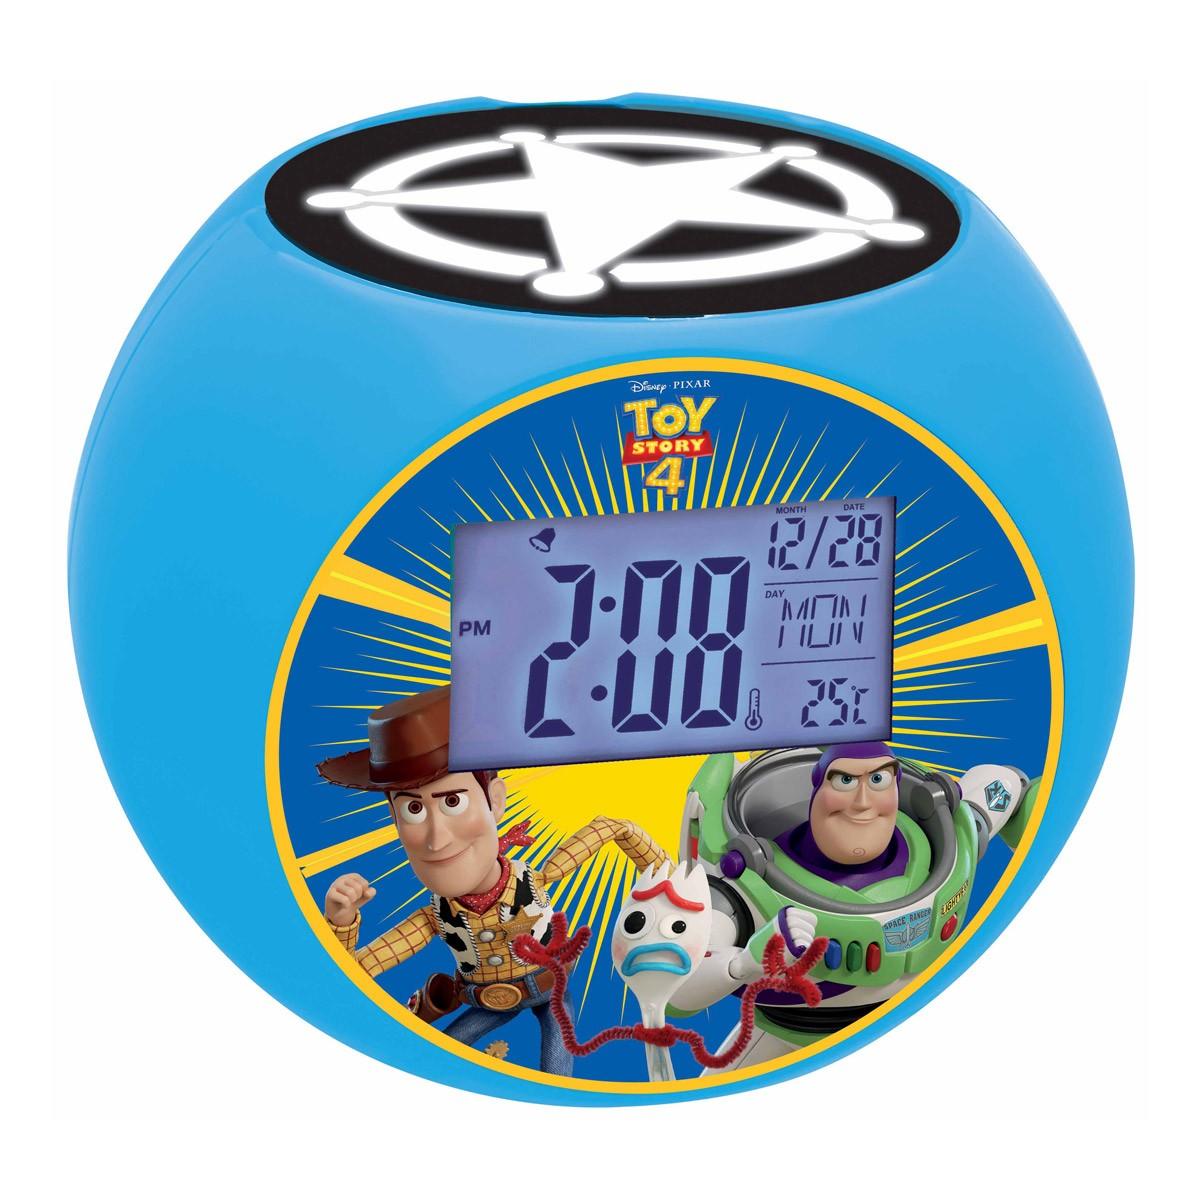 Radio réveil projecteur Toy Story 4